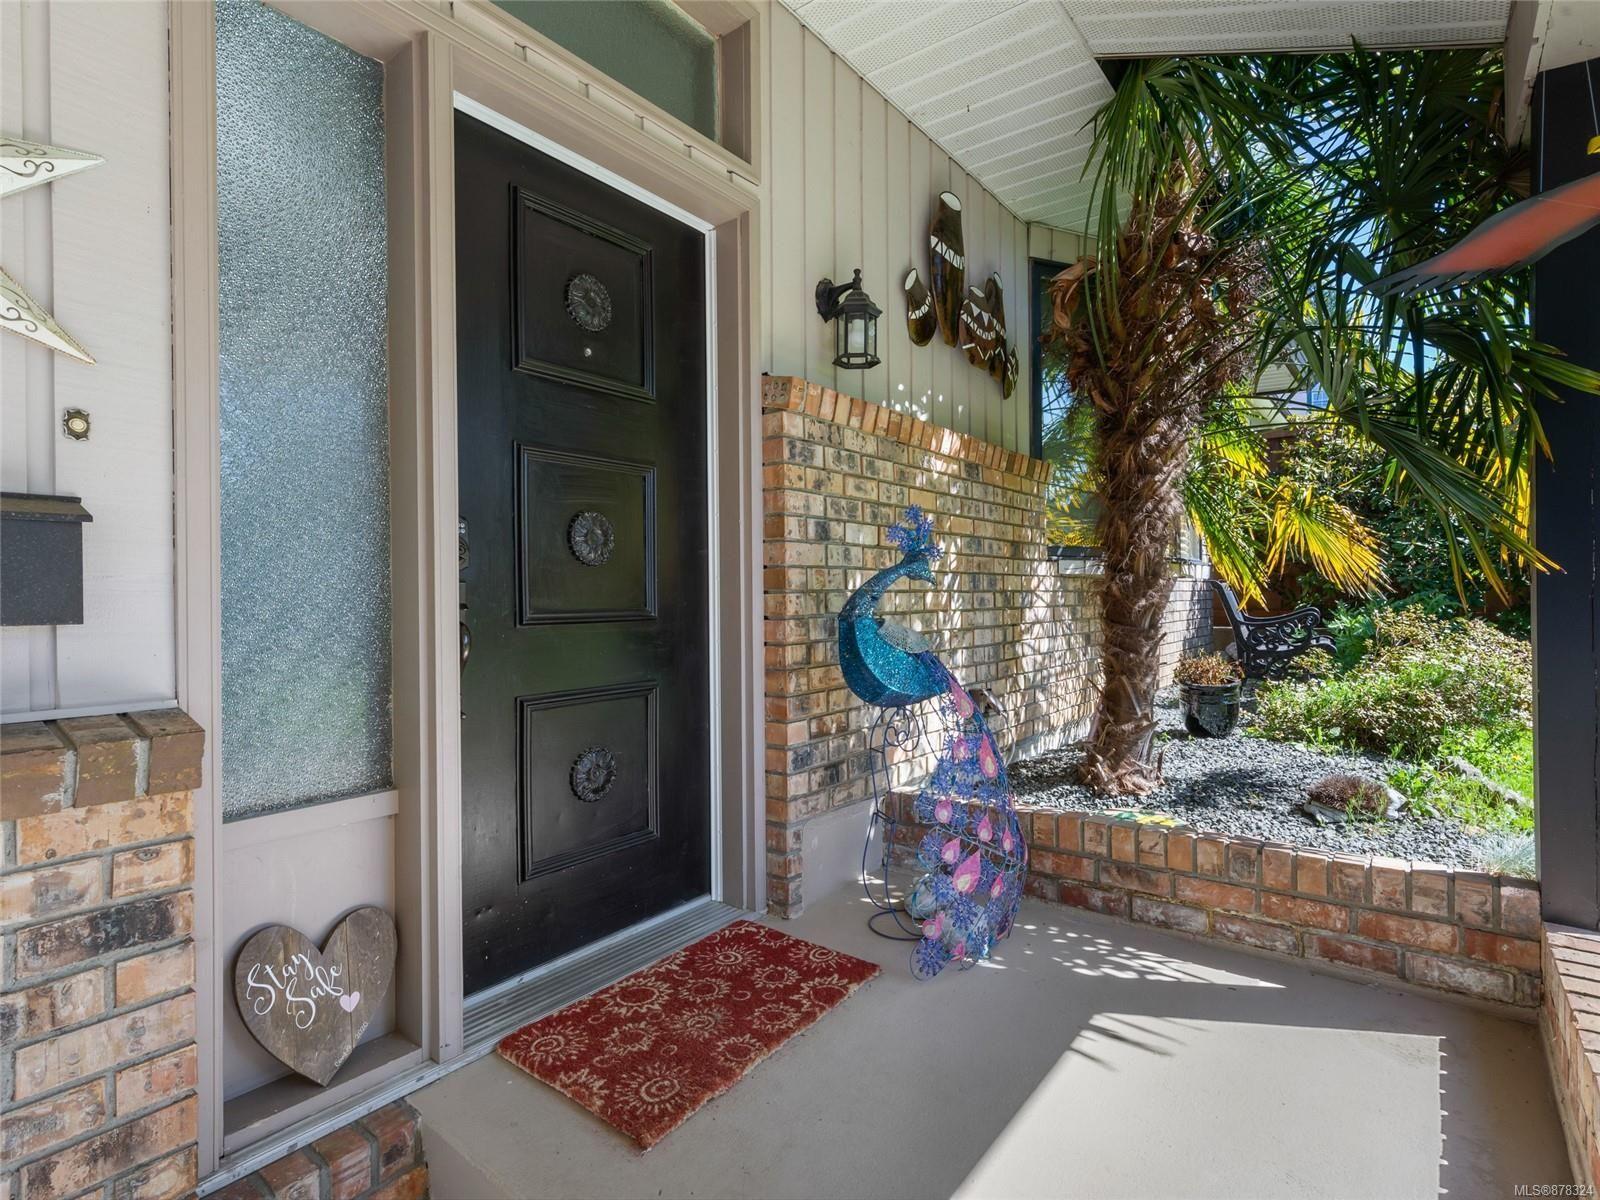 Photo 43: Photos: 3875 Moore Rd in : PA Port Alberni House for sale (Port Alberni)  : MLS®# 878324